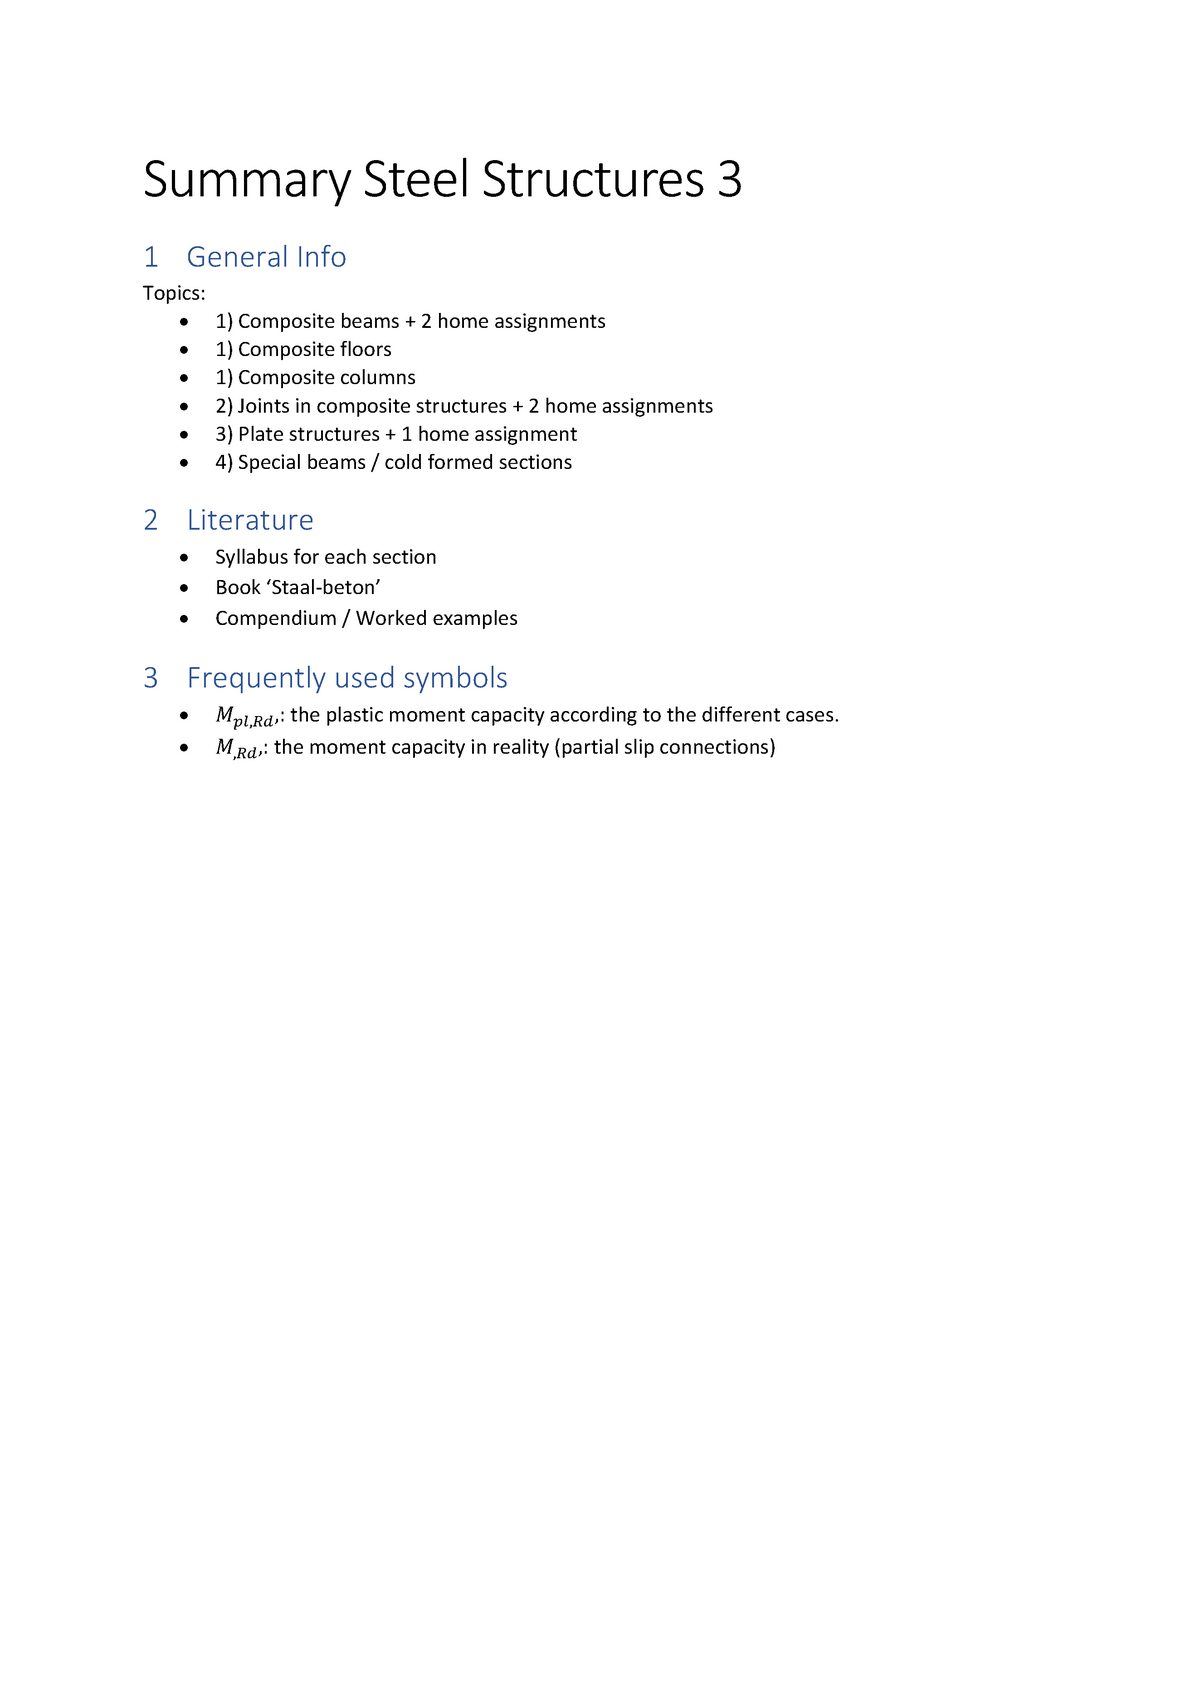 Summary Steel Structures 3 - CIE4121 - TU Delft - StudeerSnel